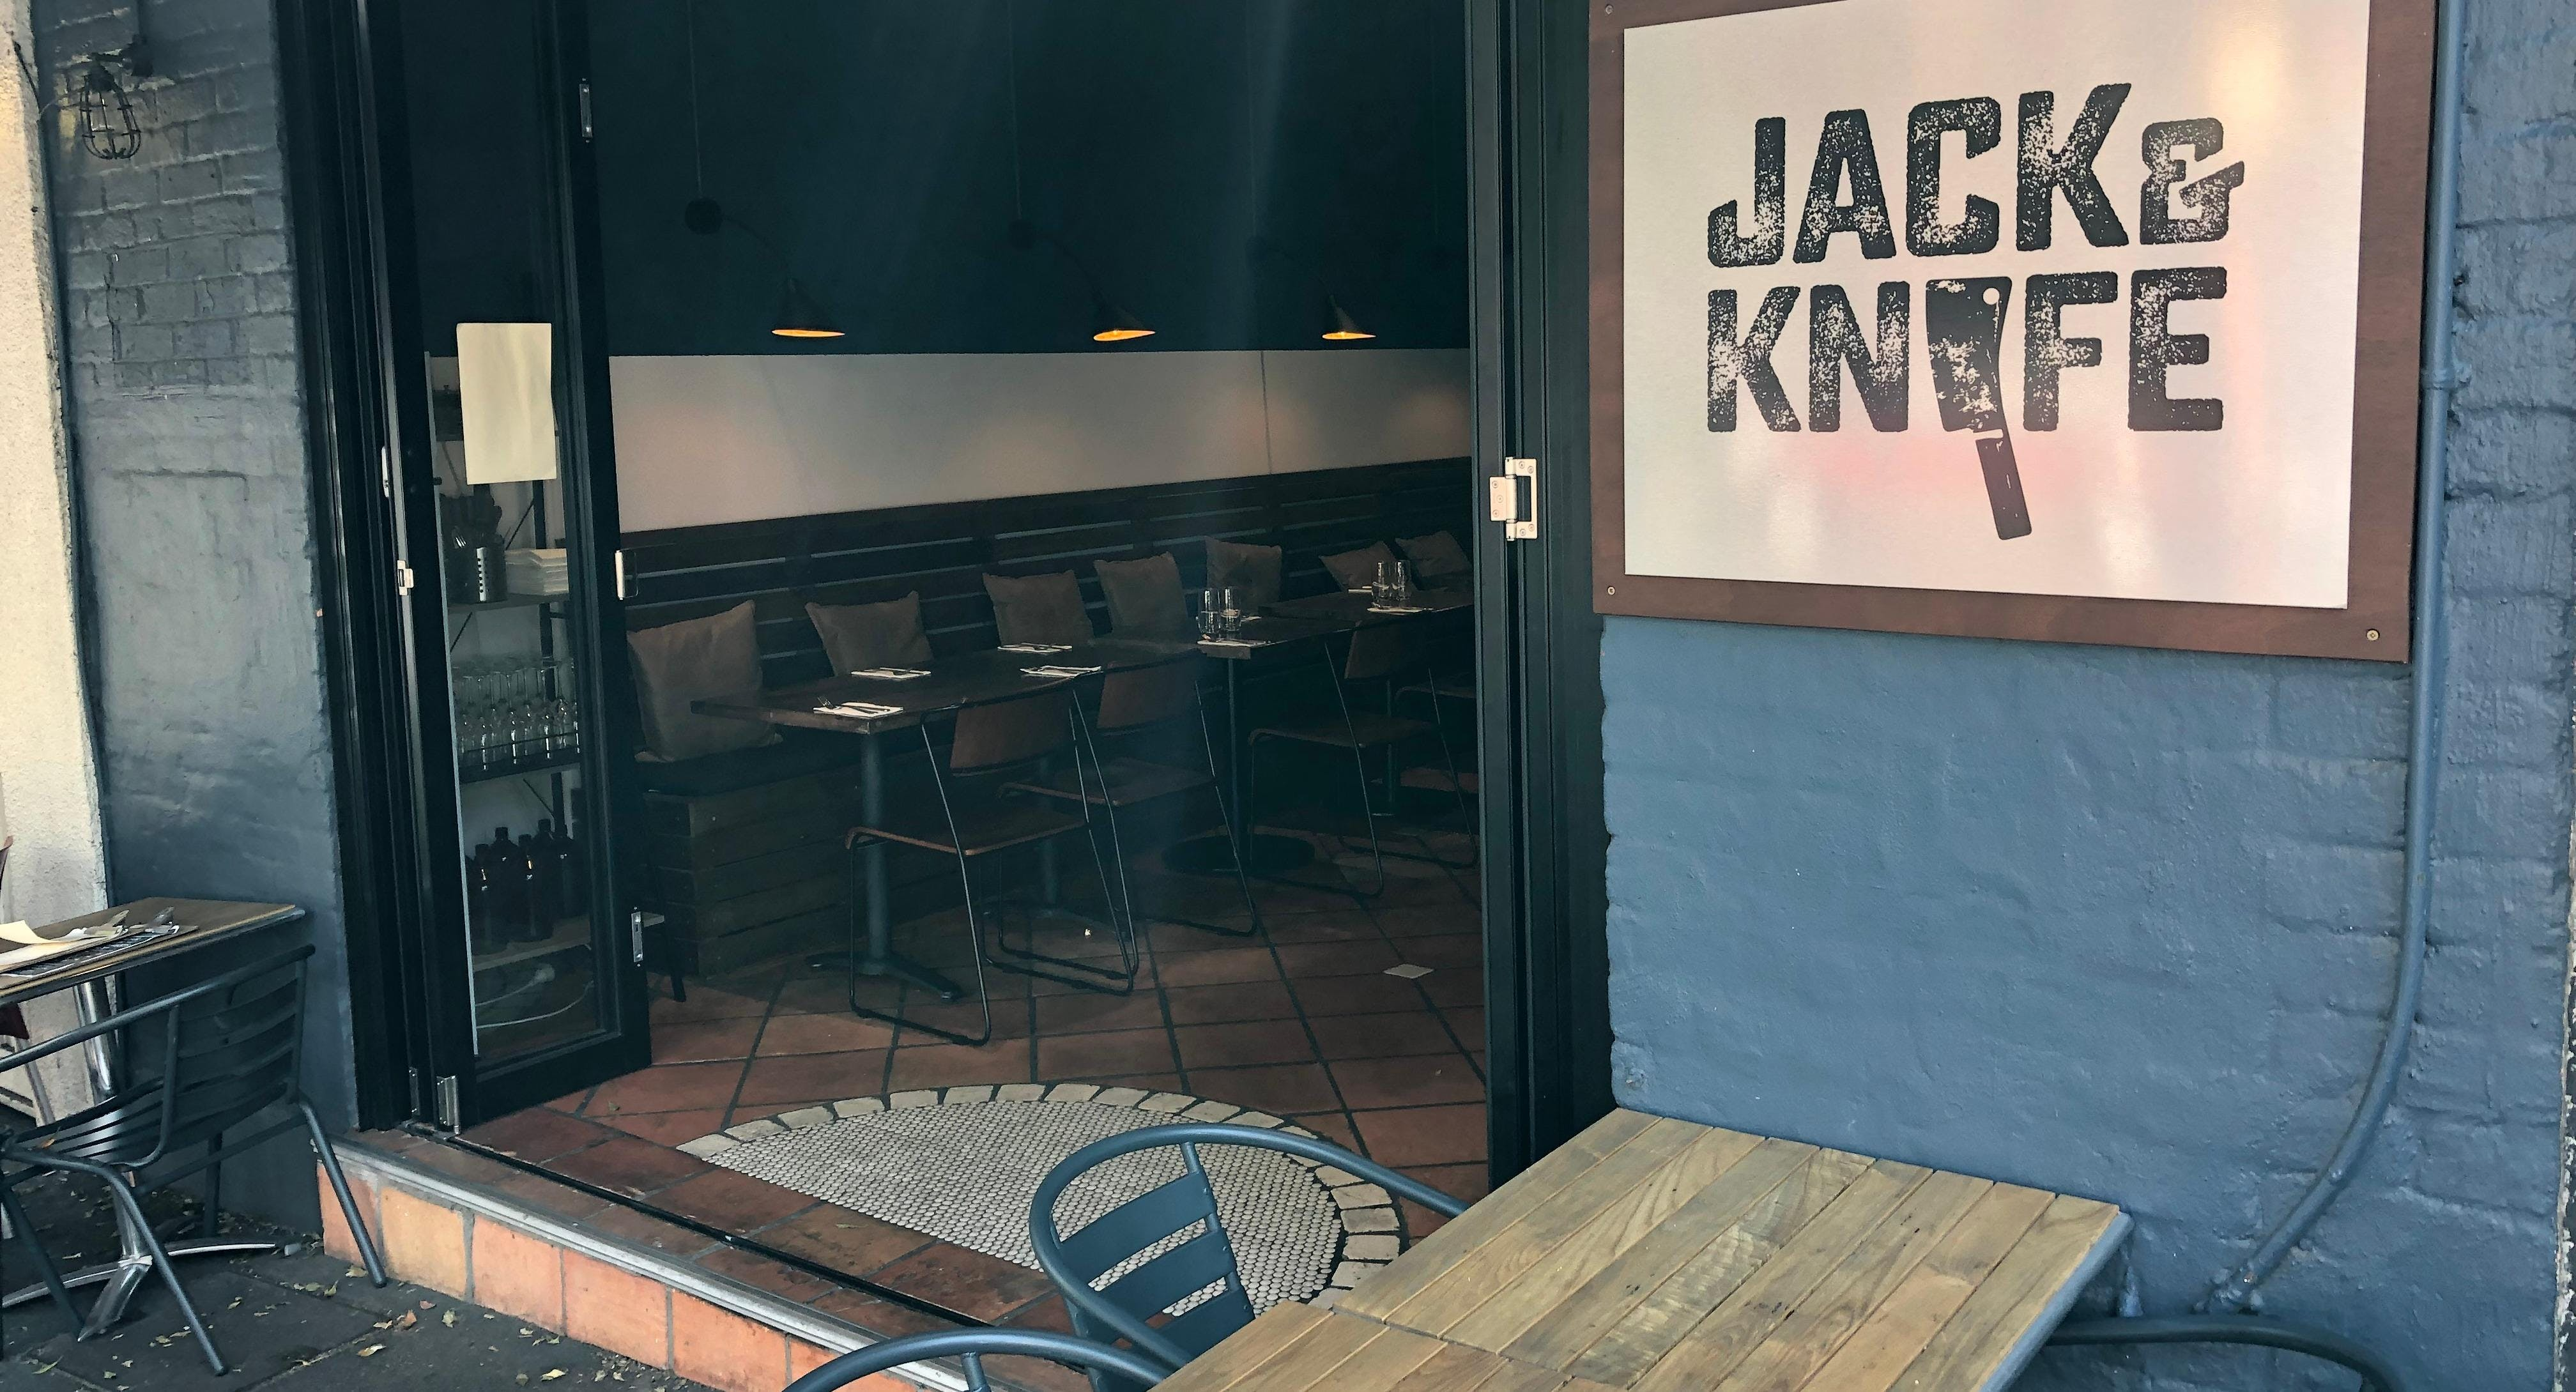 Jack & Knife